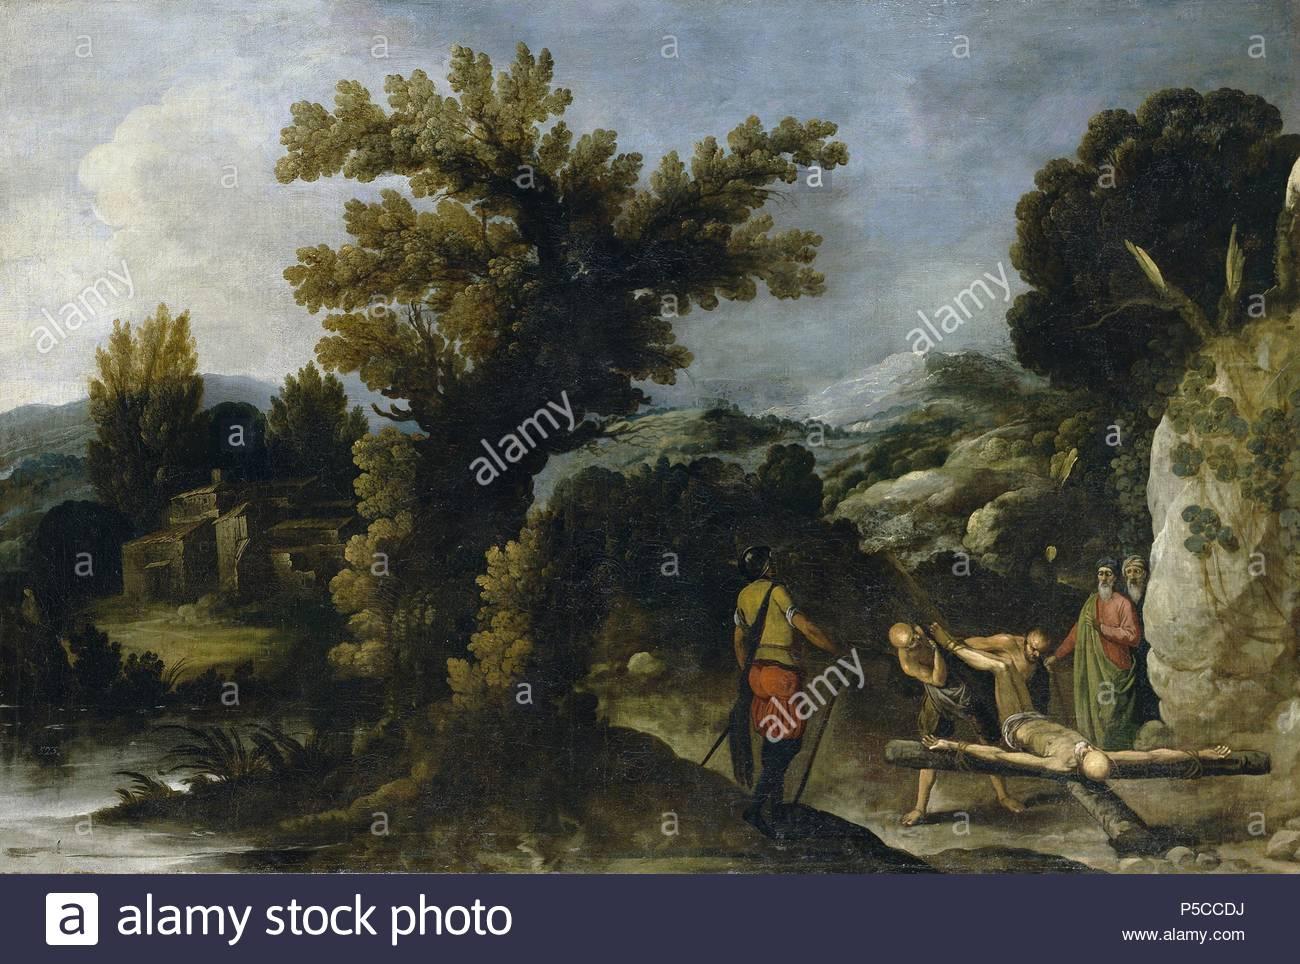 Francisco Collantes / 'Landscape with the Crucifixion of Saint Peter', First half 17th century, Spanish School, Canvas, 110 cm x 163 cm, P07413. Artwork also known as: Paisaje con la crucifixión de San Pedro. Museum: MUSEO DEL PRADO. - Stock Image